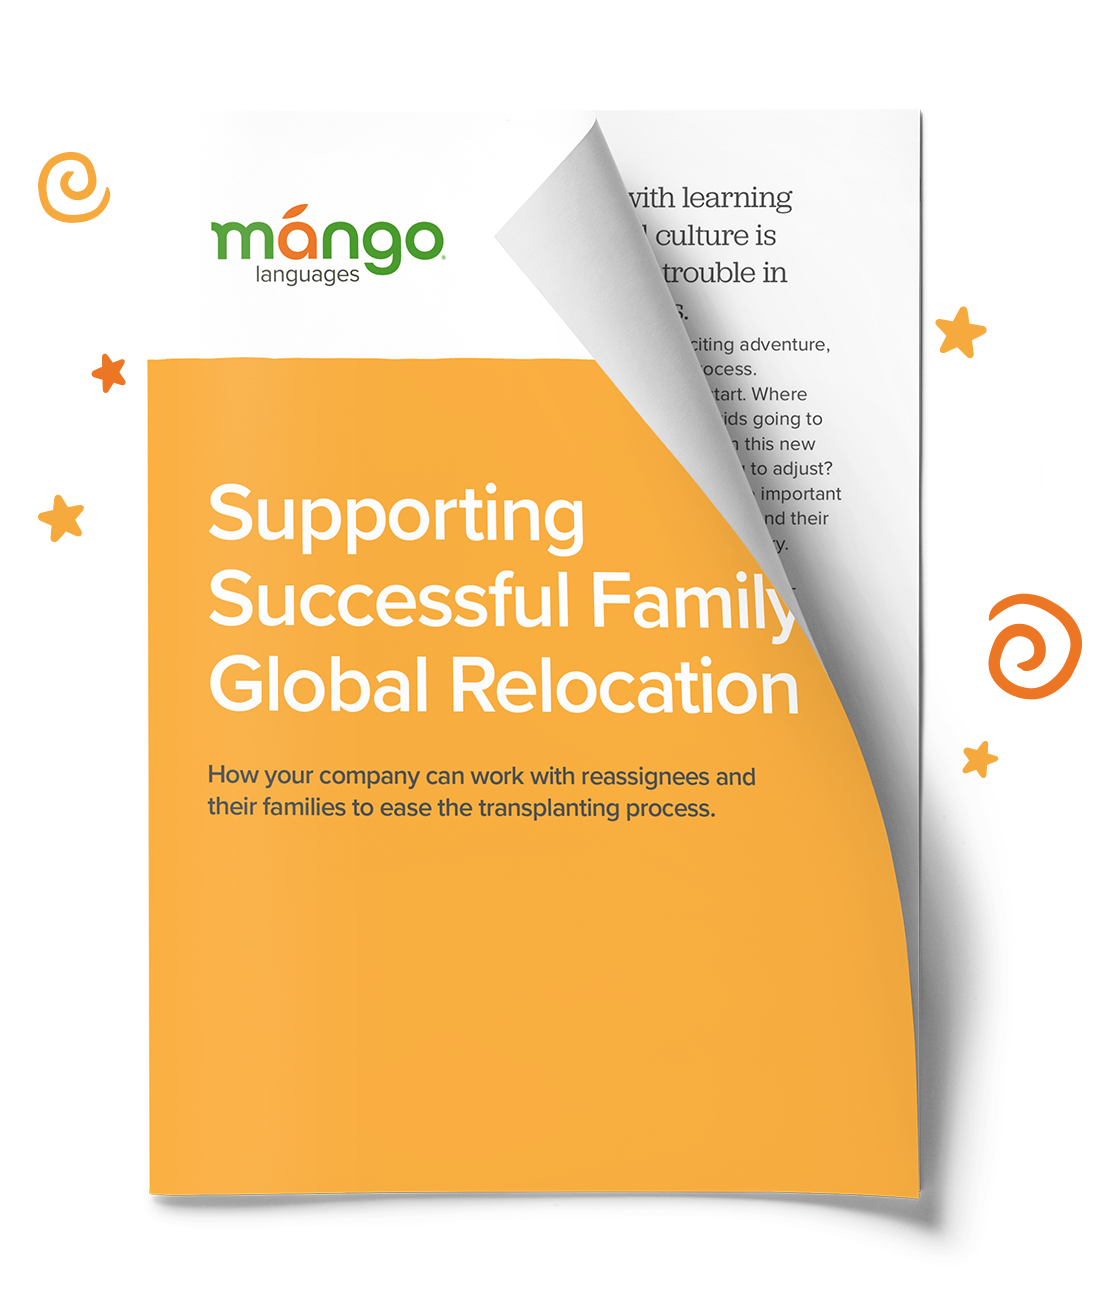 mango-inbound-global-relocation.png